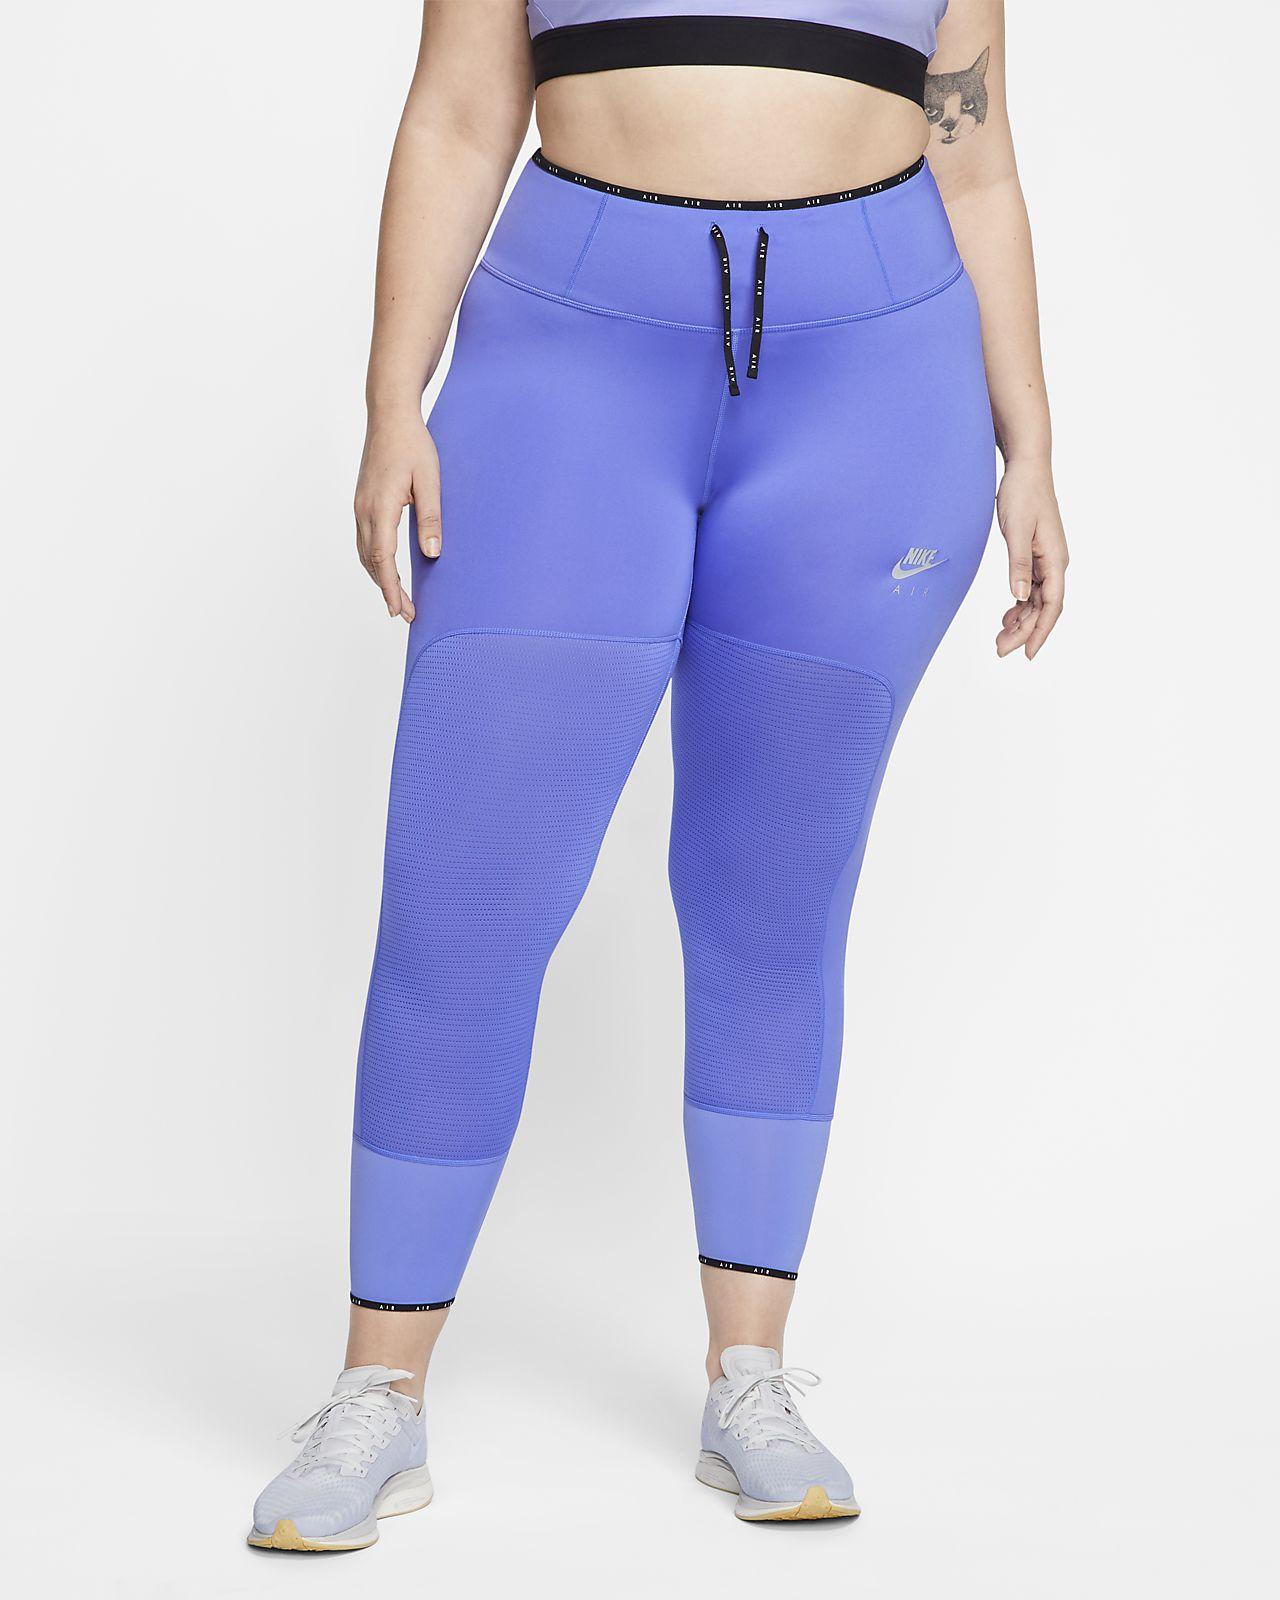 Nike Women/'s Dry Fit Capri Running Leggings Size Extra Small New